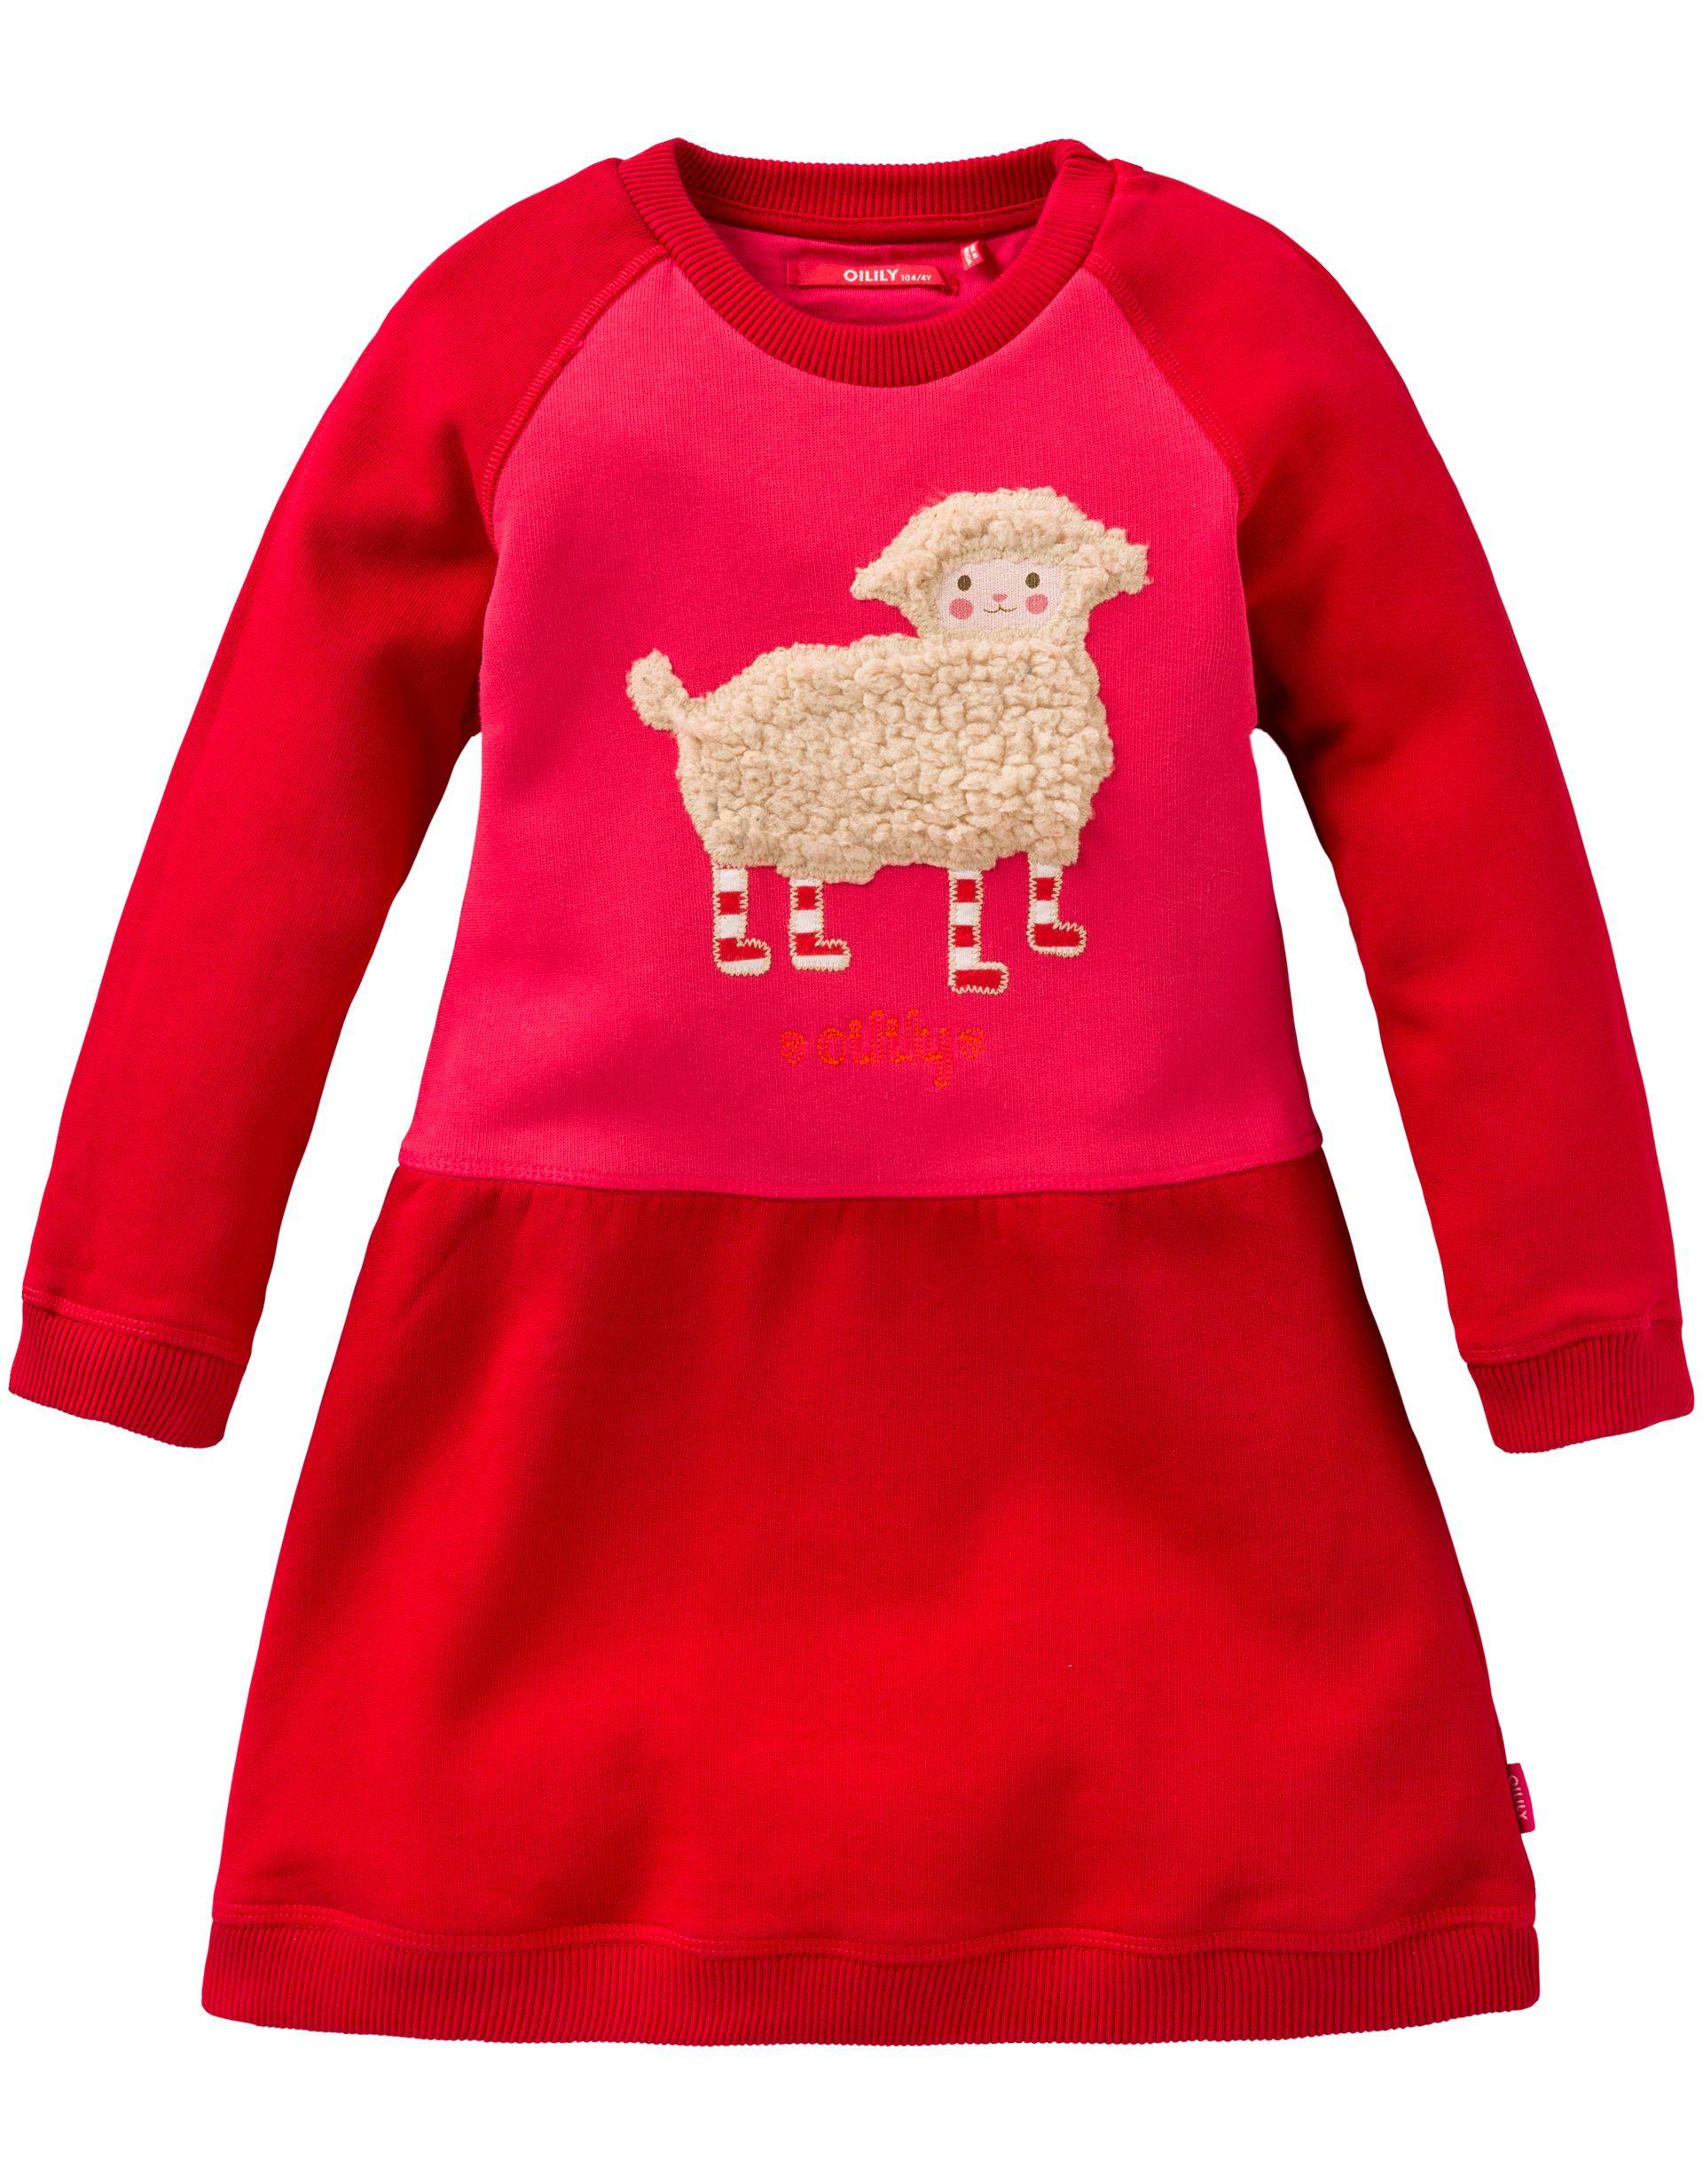 5a07b852c OILILY Children's Wear - Fall Winter 2014 - Dress Heya | Bubala ...